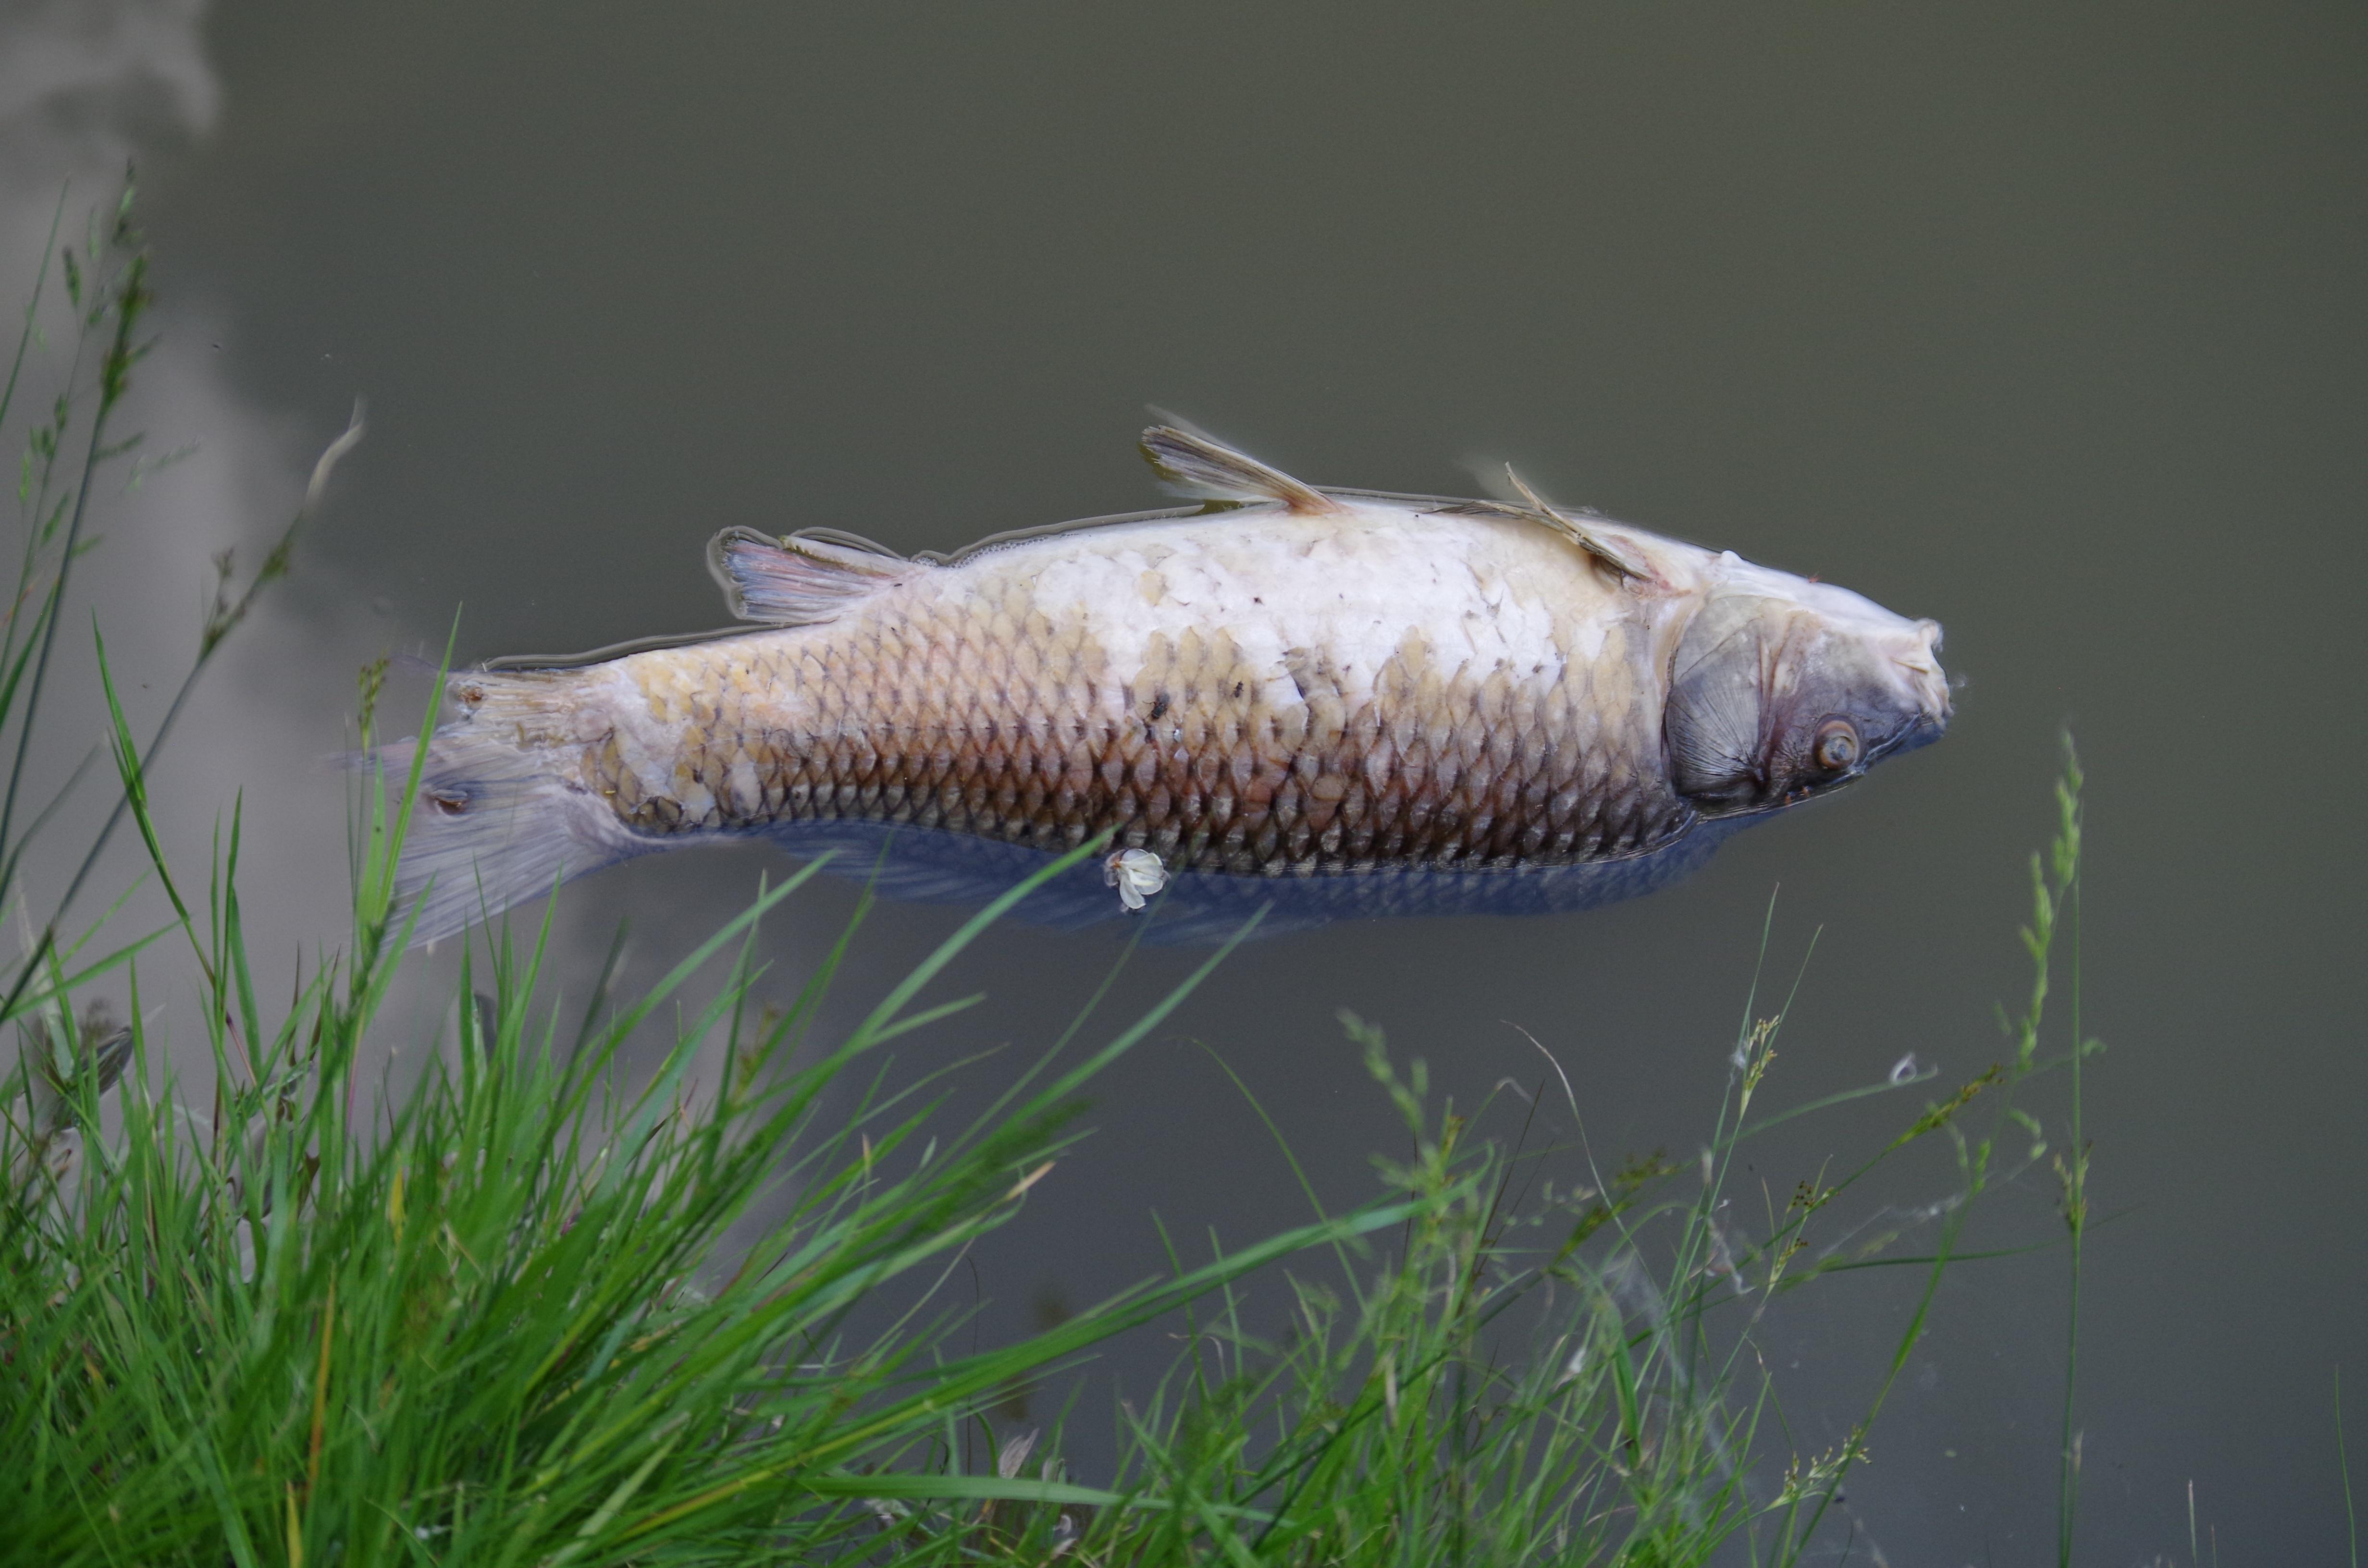 Free Images : pond, swim, fish, dead, fauna, carcass